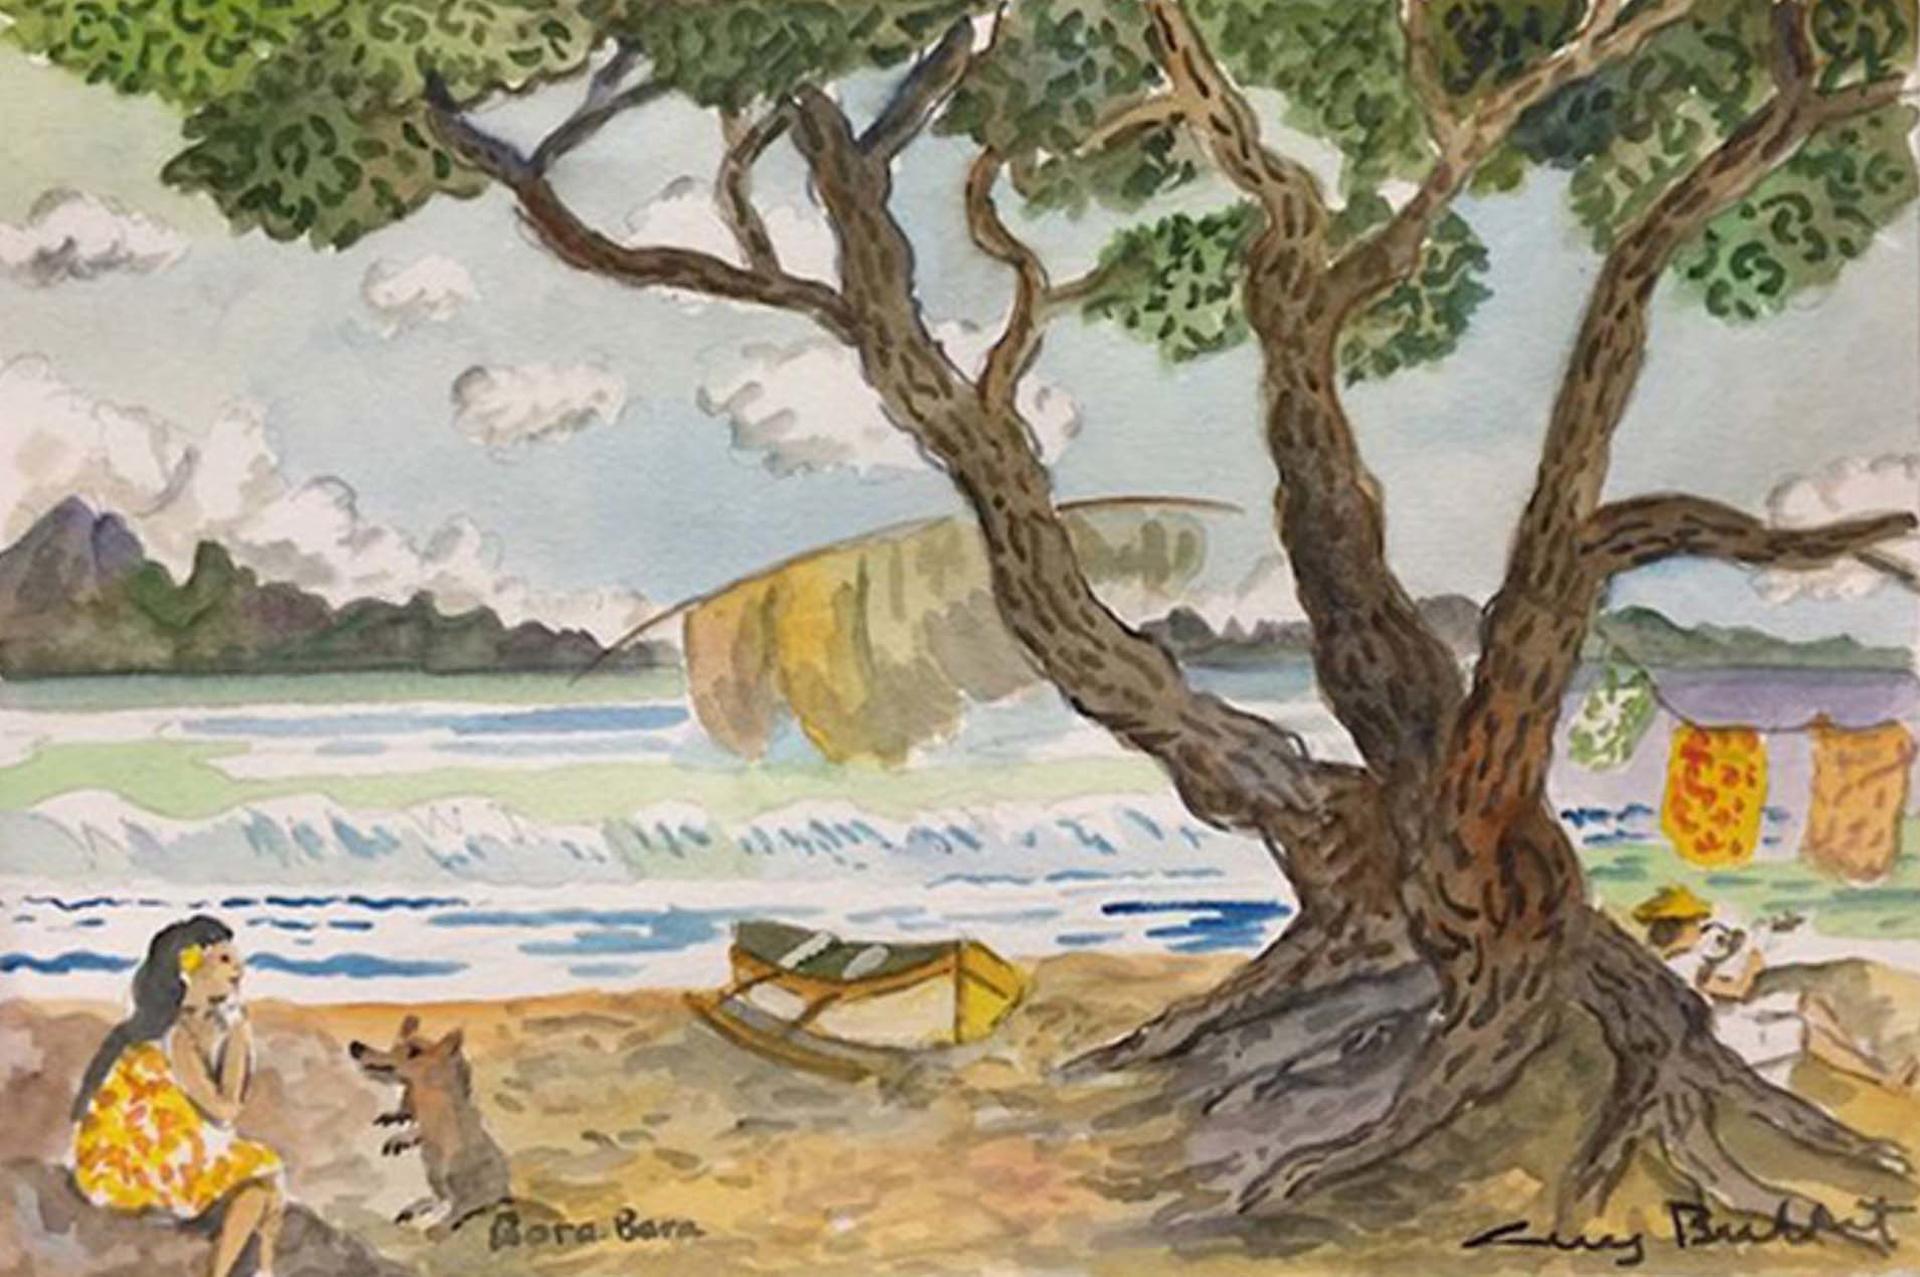 Bora Bora by Guy Buffet